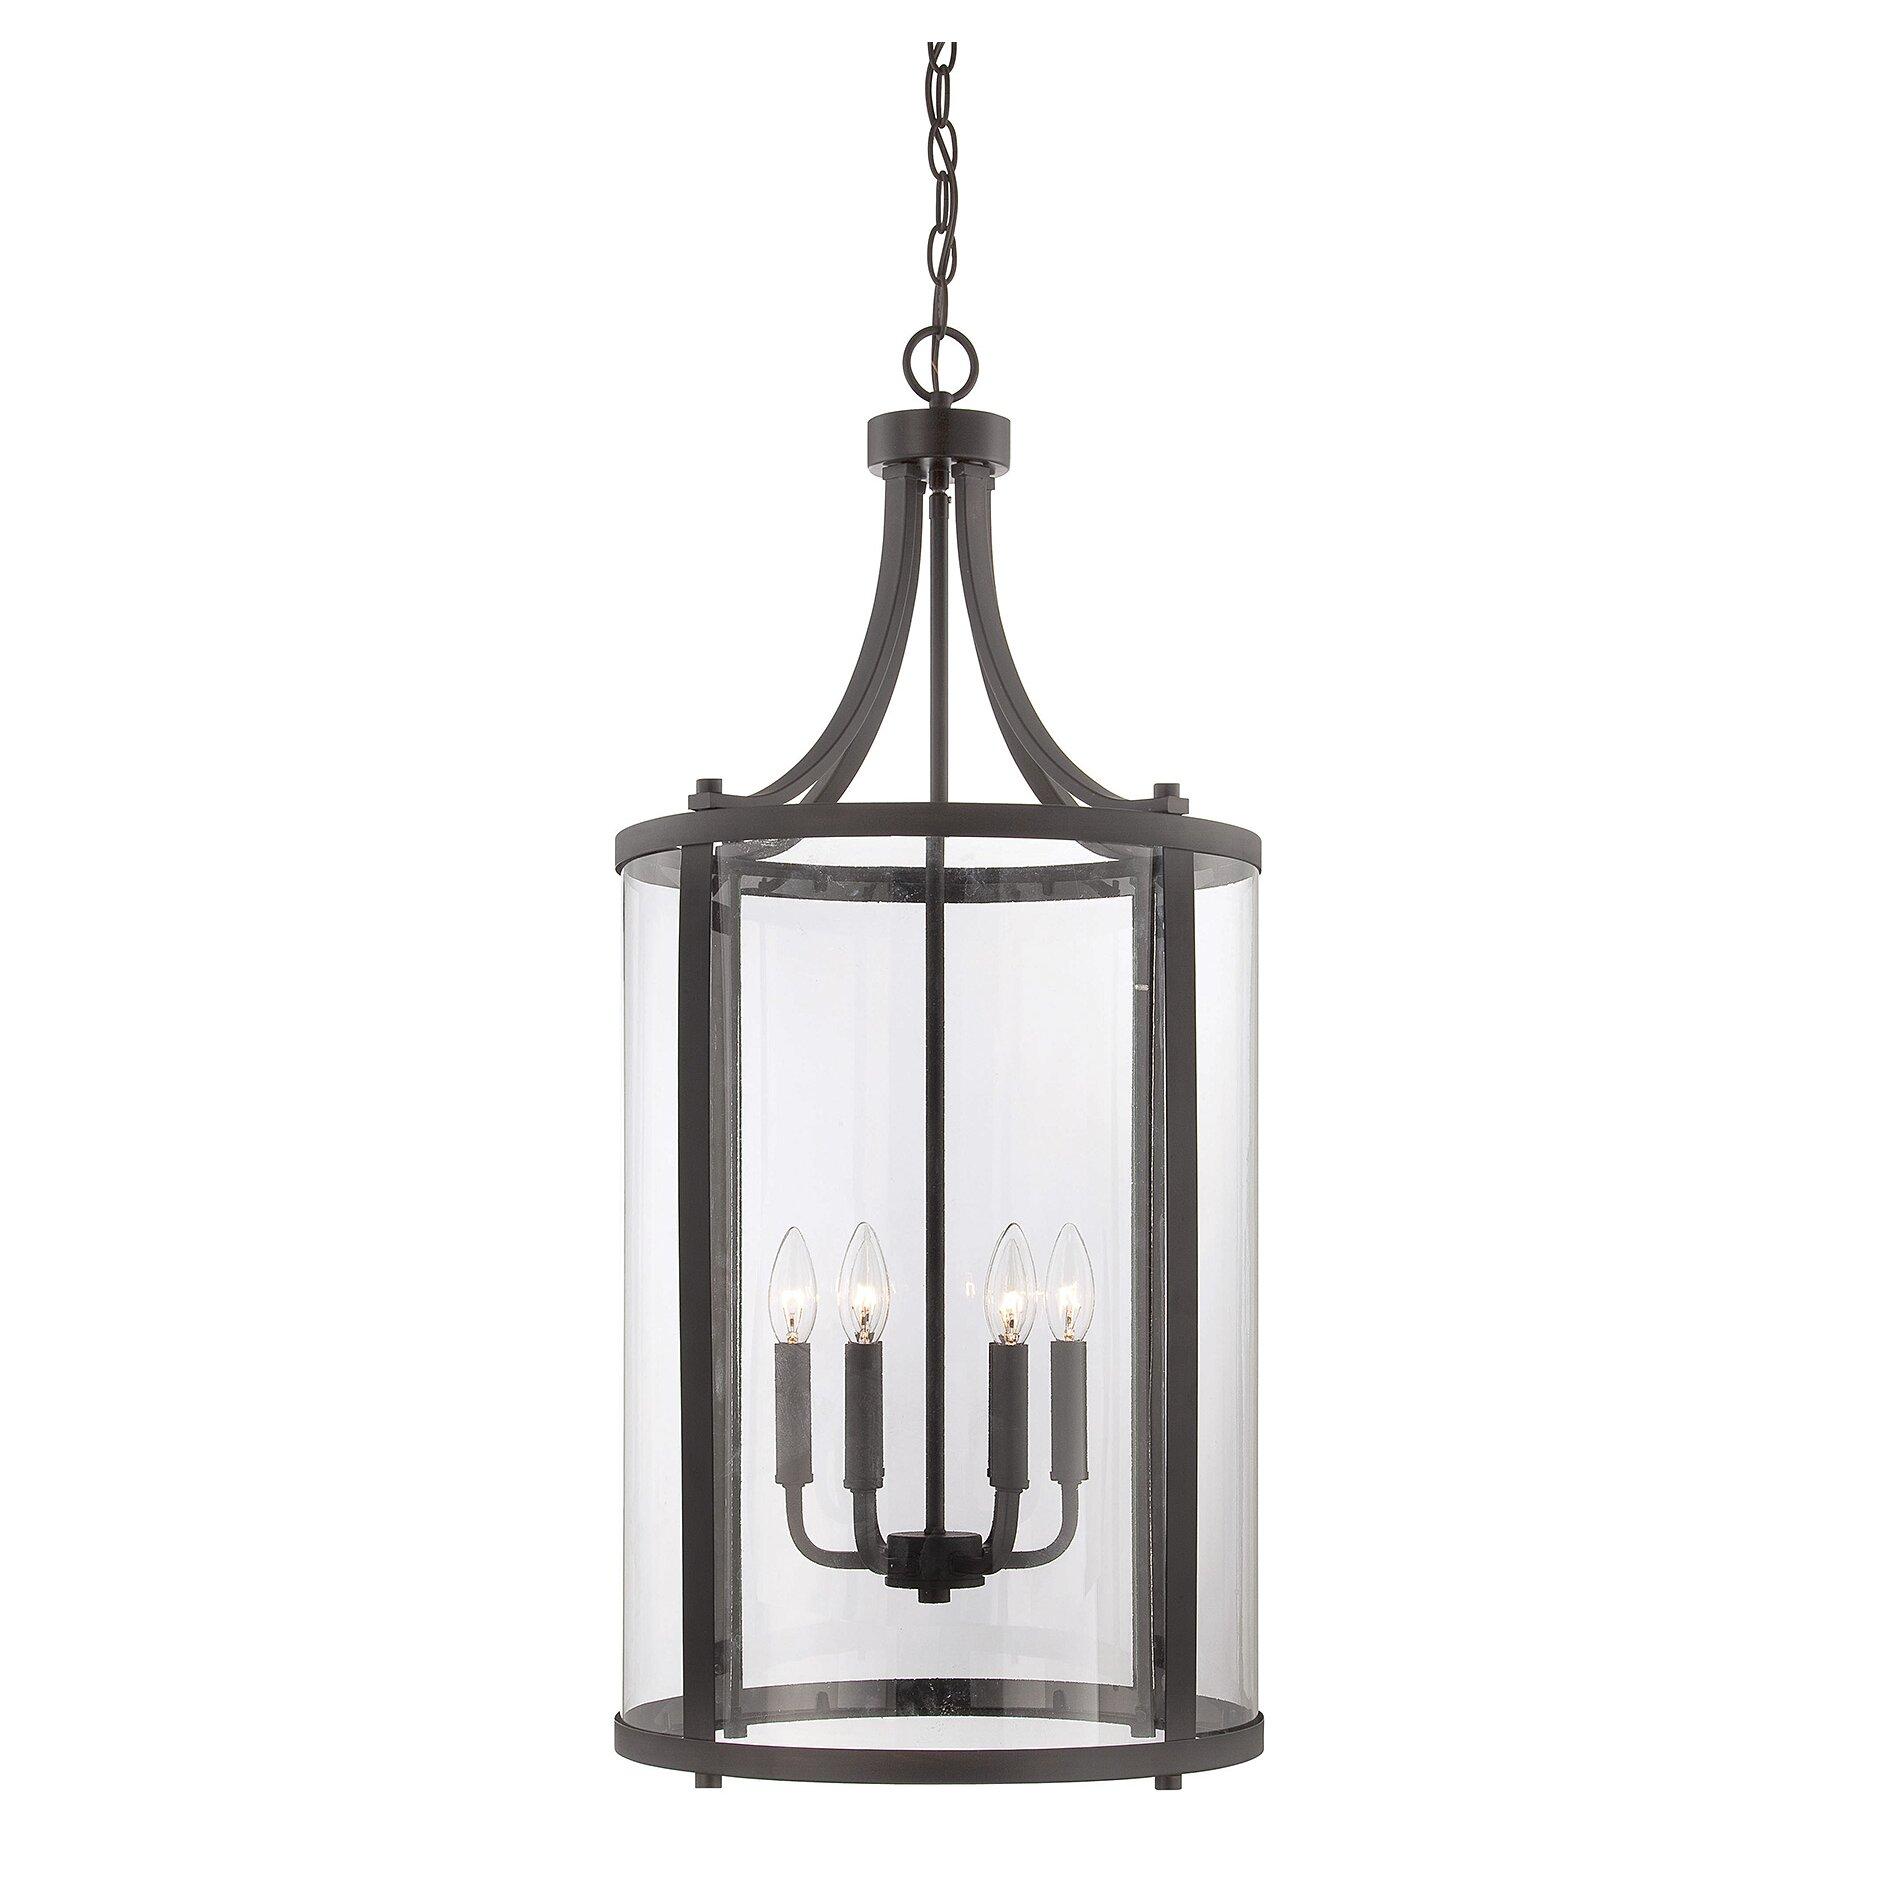 Savoy house penrose 6 light medium foyer lantern reviews for Savoy house